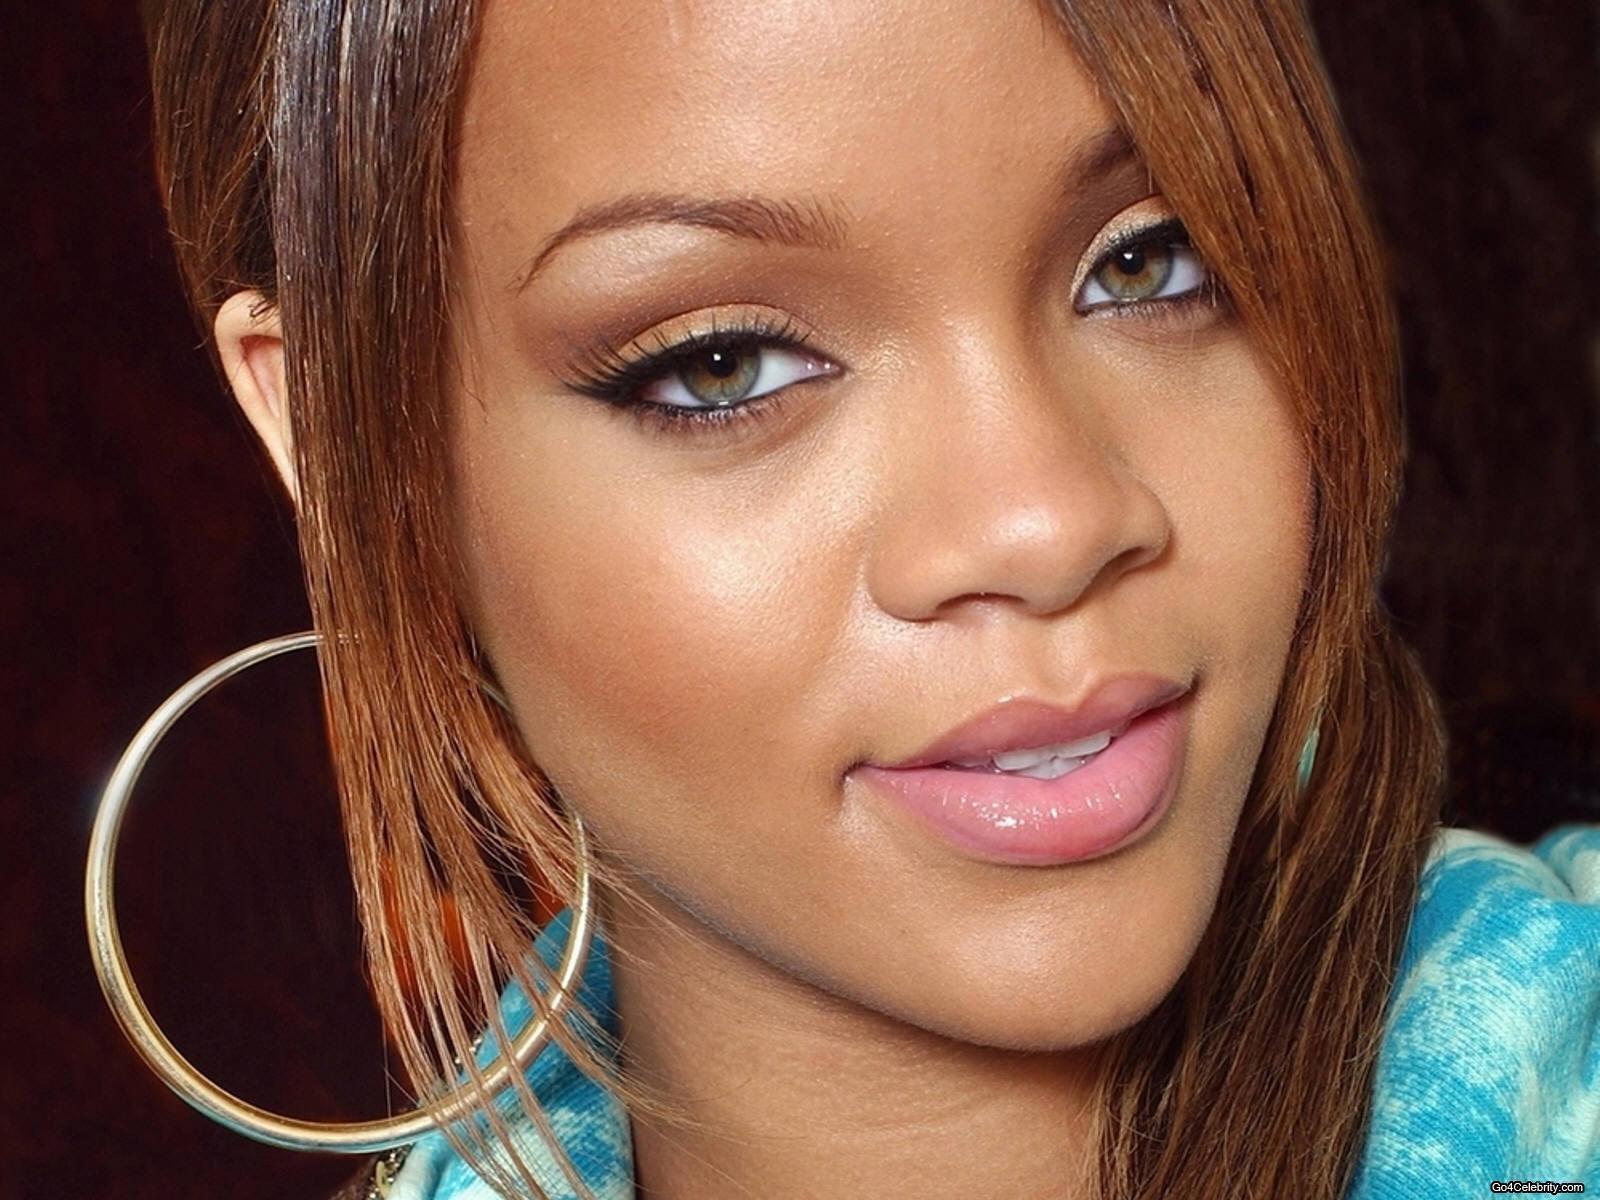 All About Rihanna